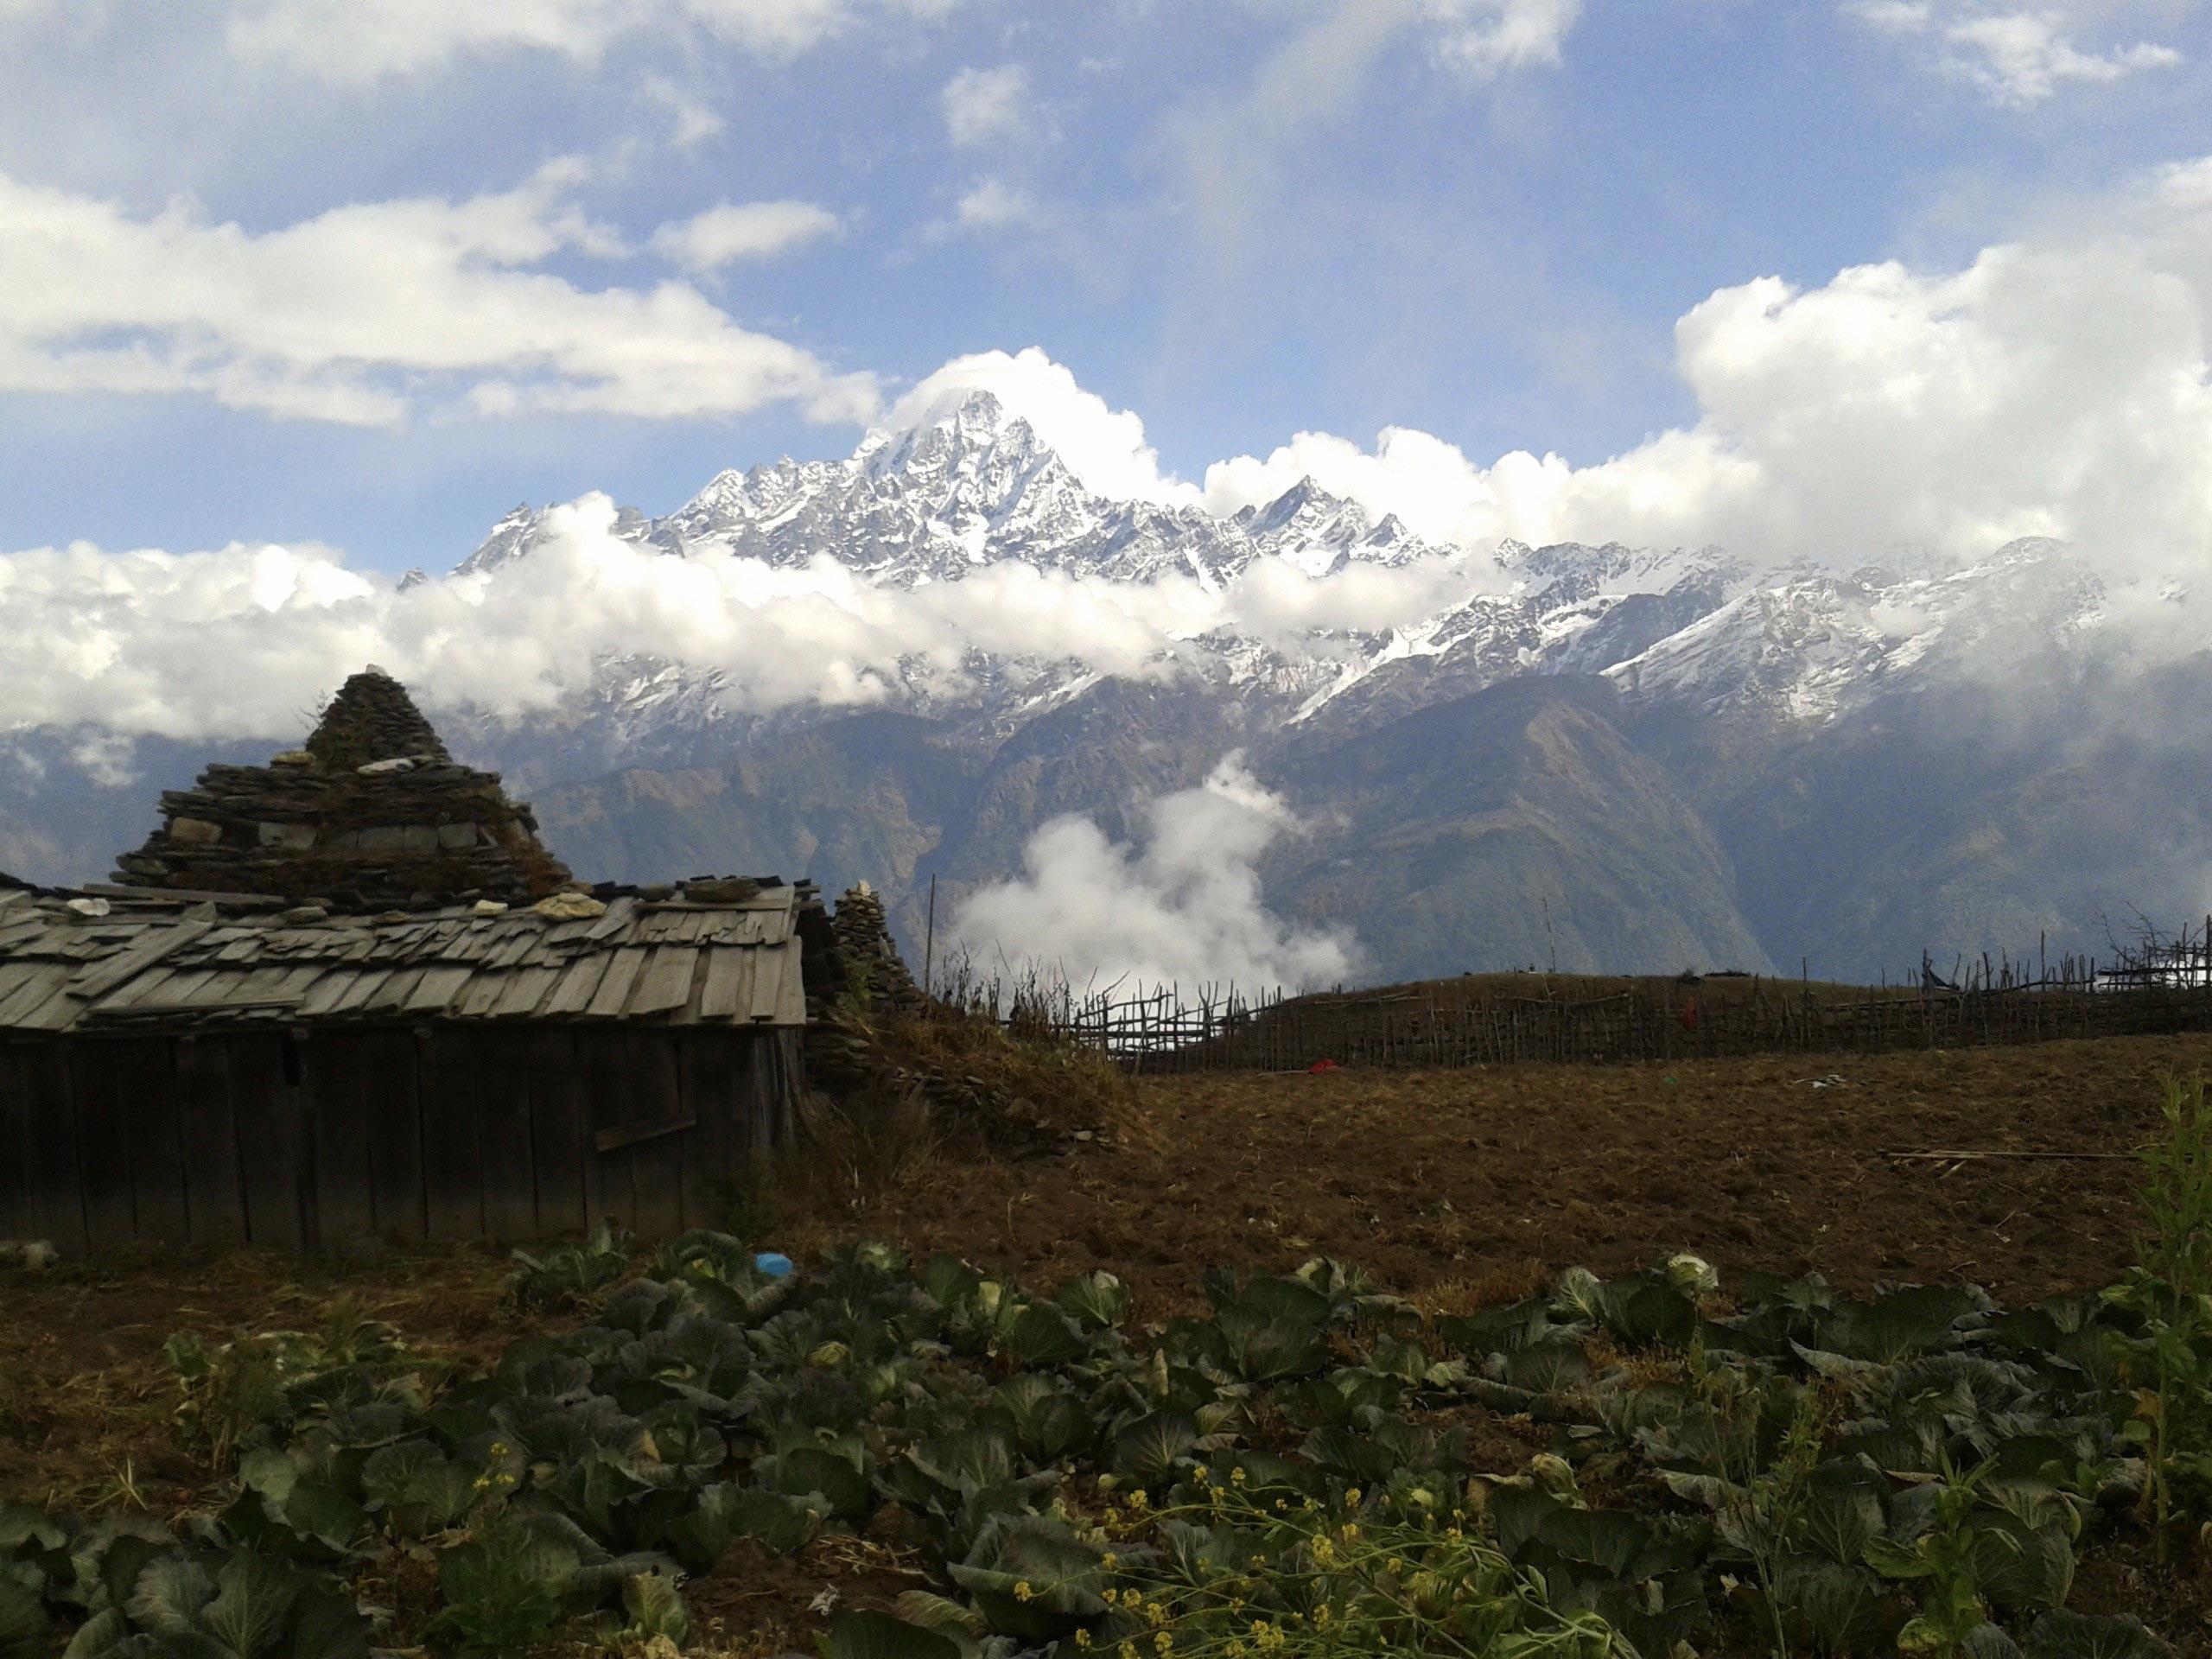 Trek au cœur de l'Himalaya